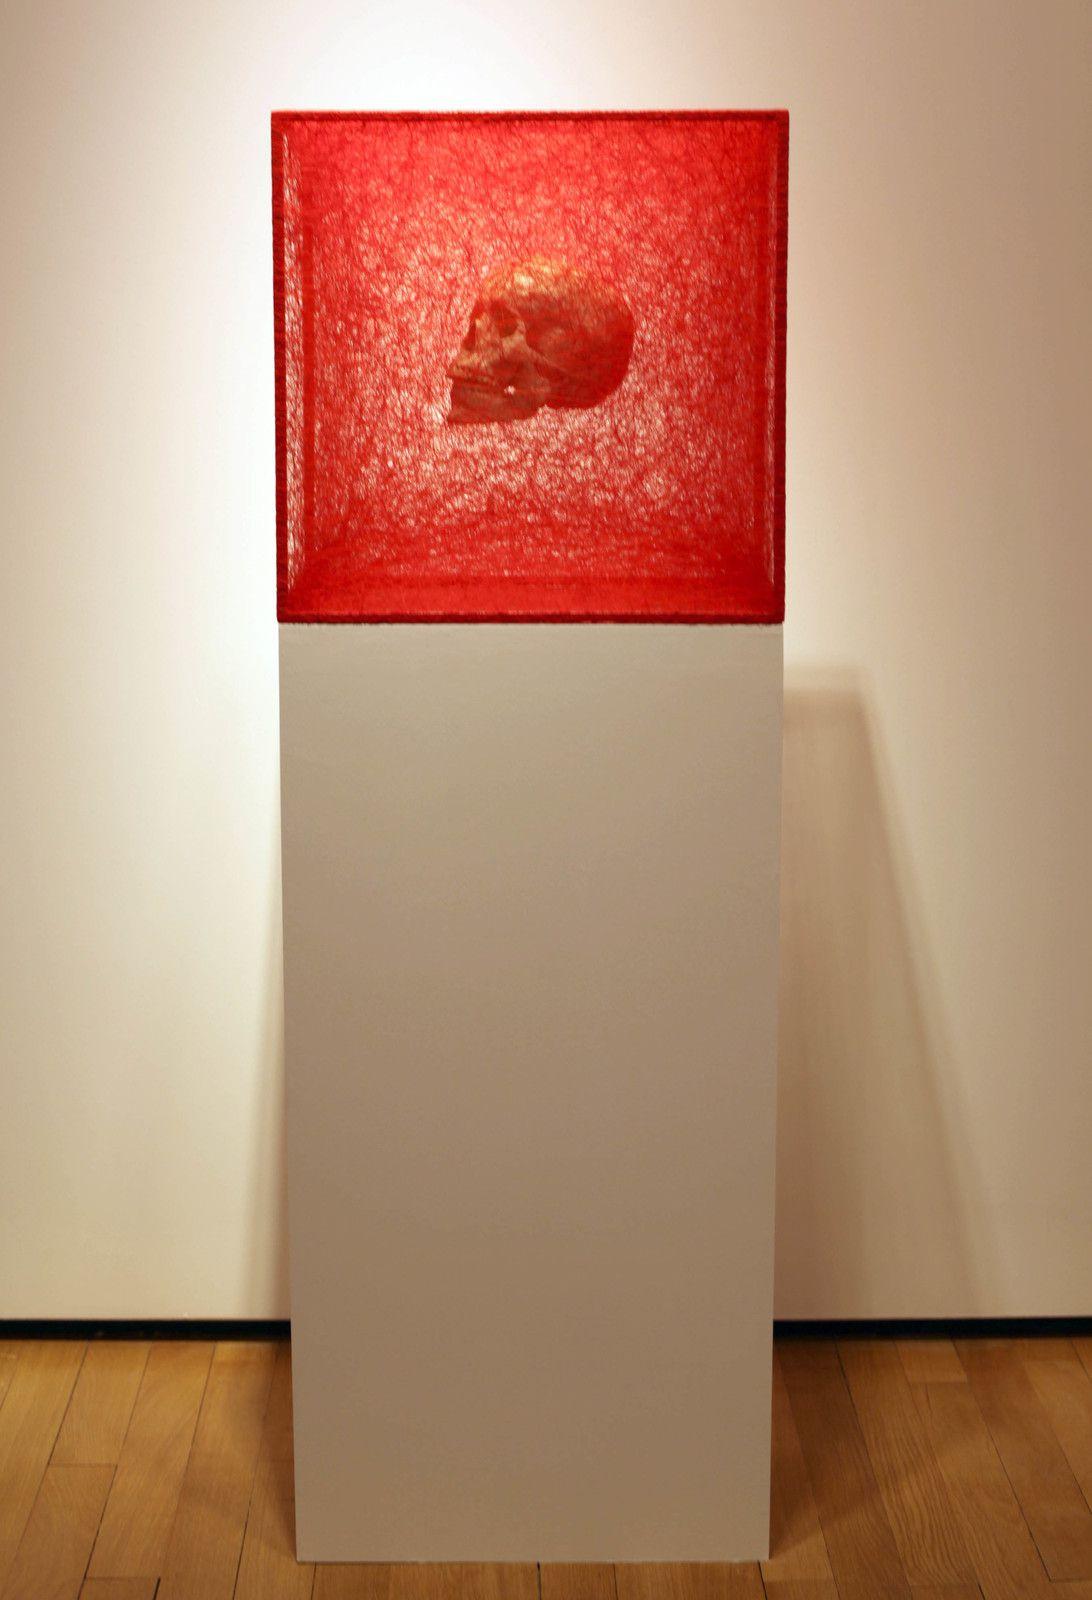 """State of Being (Skull), 2020 de Chiharu SHIOTA - Courtesy Galerie Templon Paris © Photo Éric Simon"